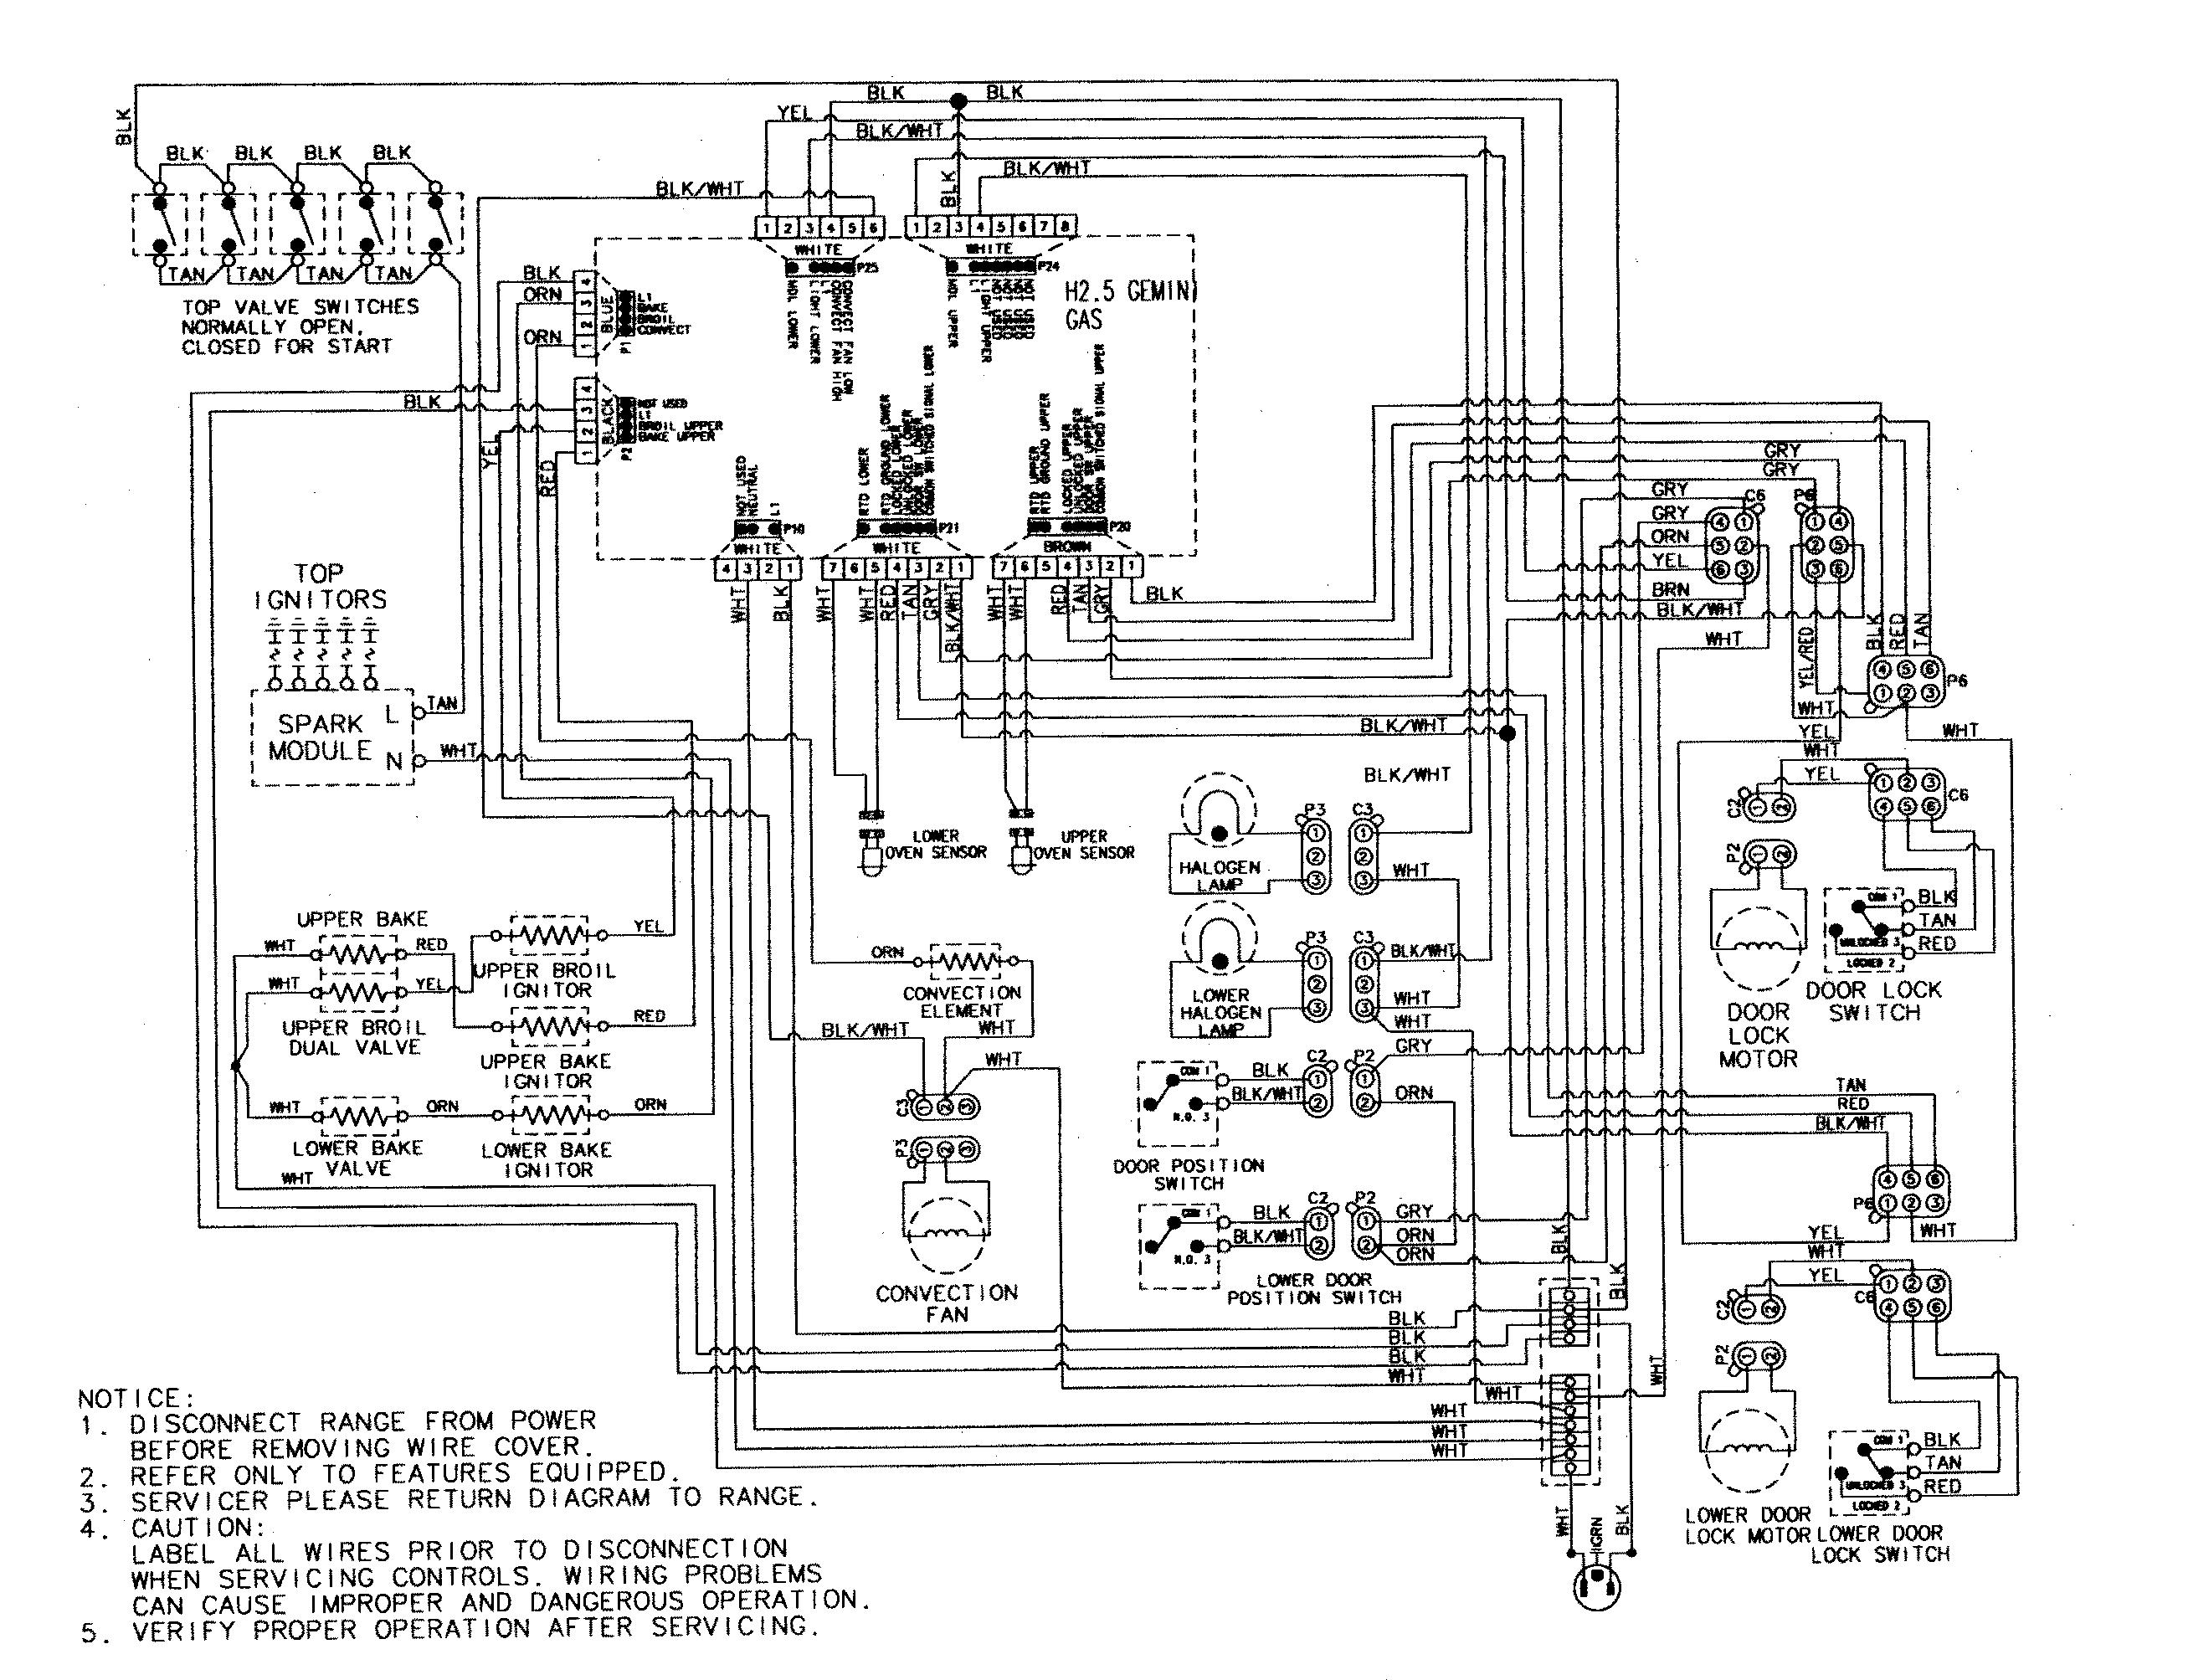 05 Chrysler Pacifica Immobilizer Wiring Diagram English Kazuma 50cc Atv Wiring Diagram Begeboy Wiring Diagram Source